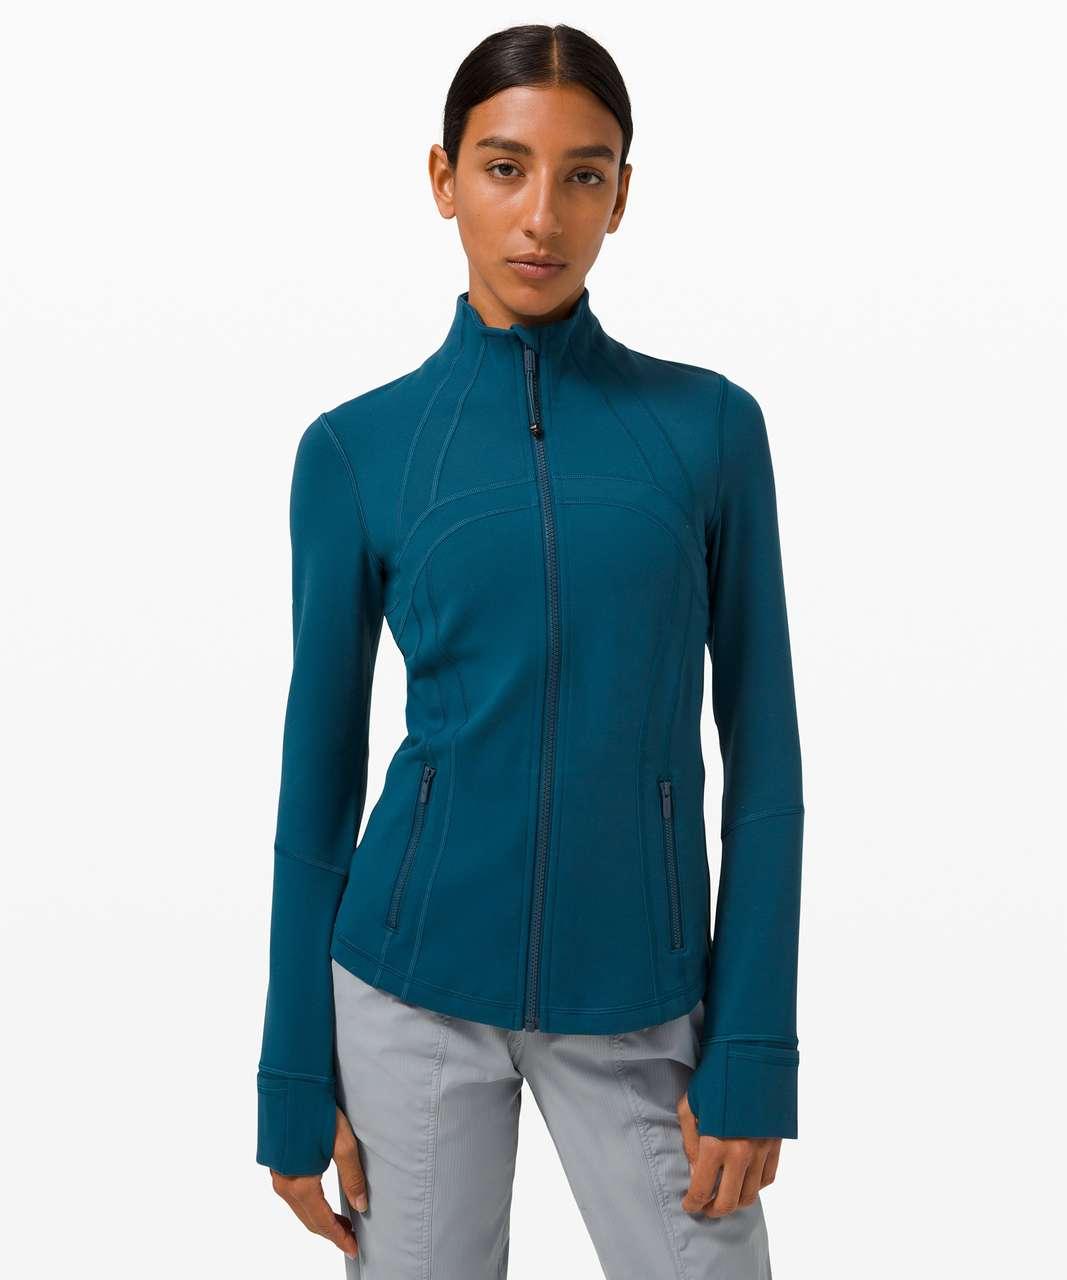 Lululemon Define Jacket - Blue Borealis